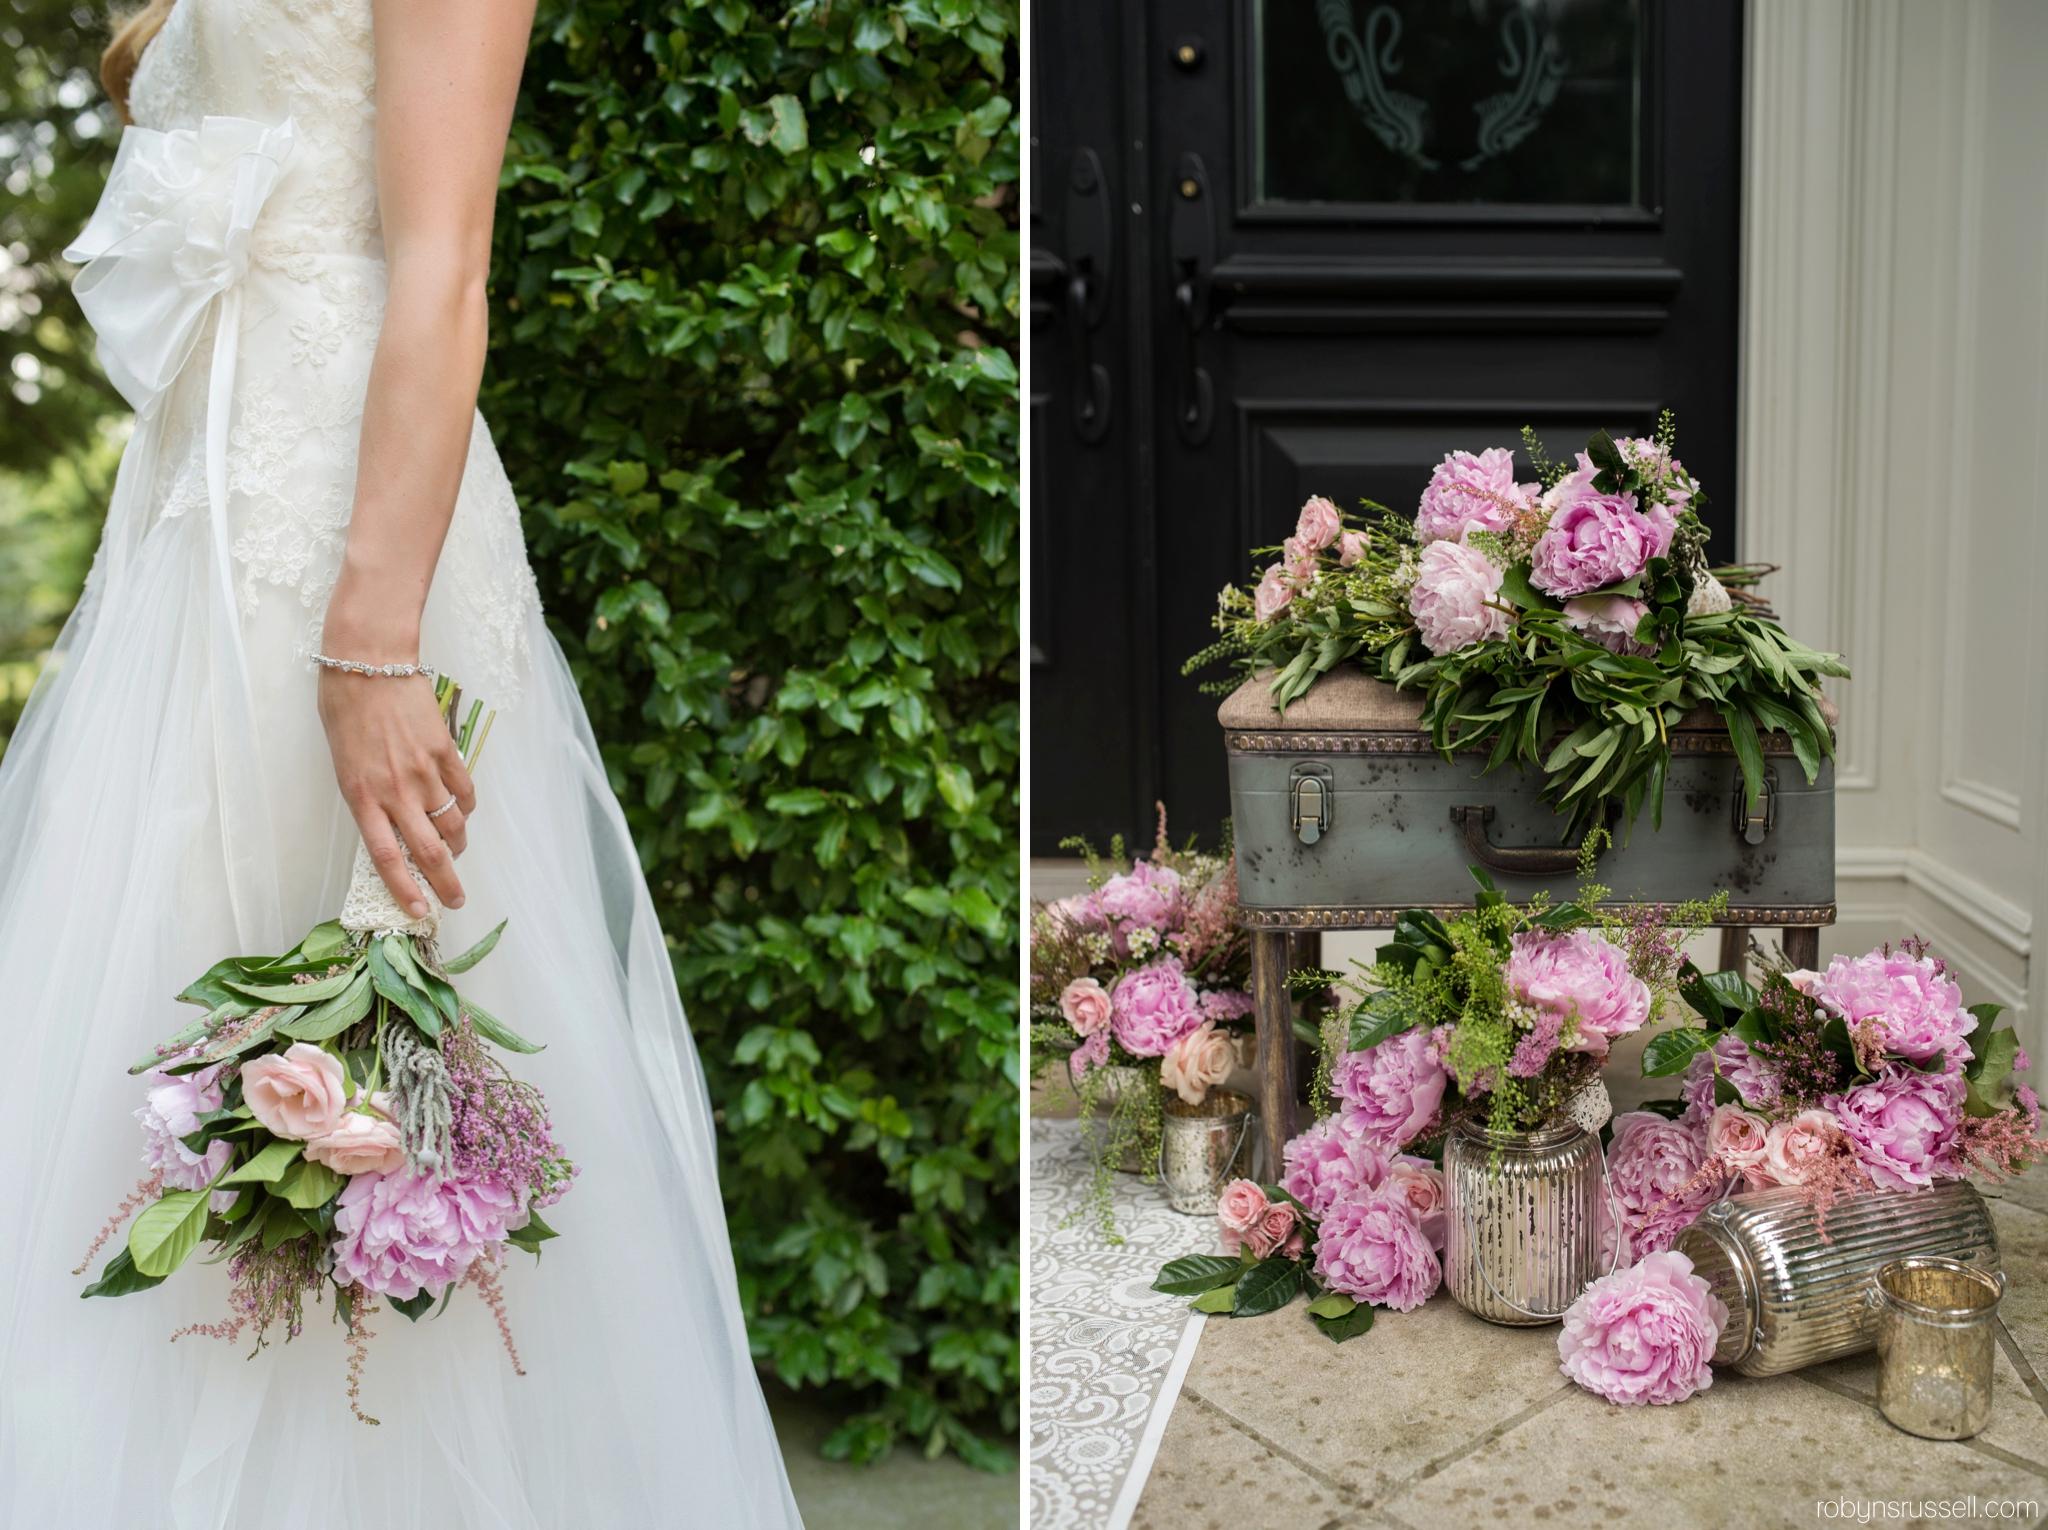 6-bridal-bouquet-beautiful-summer-flowers-settings-florist-stylist.jpg